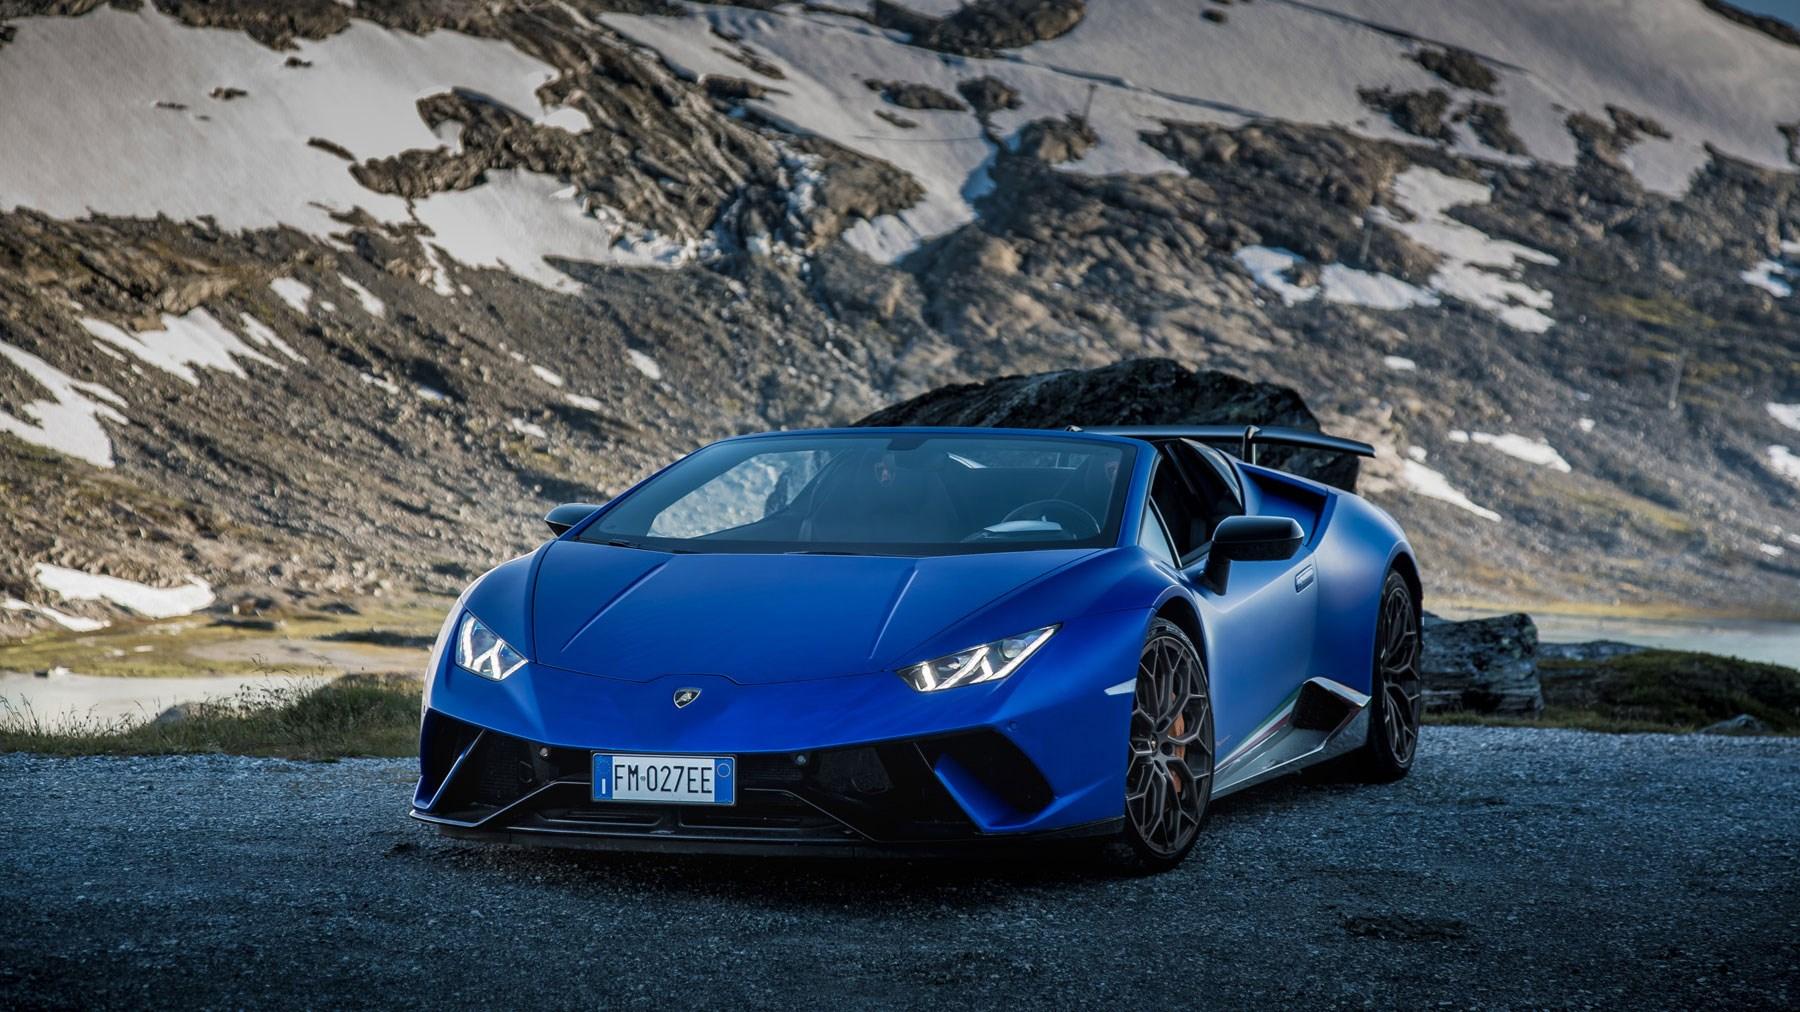 Lamborghini Huracán Performante Spyder Review Drop Top